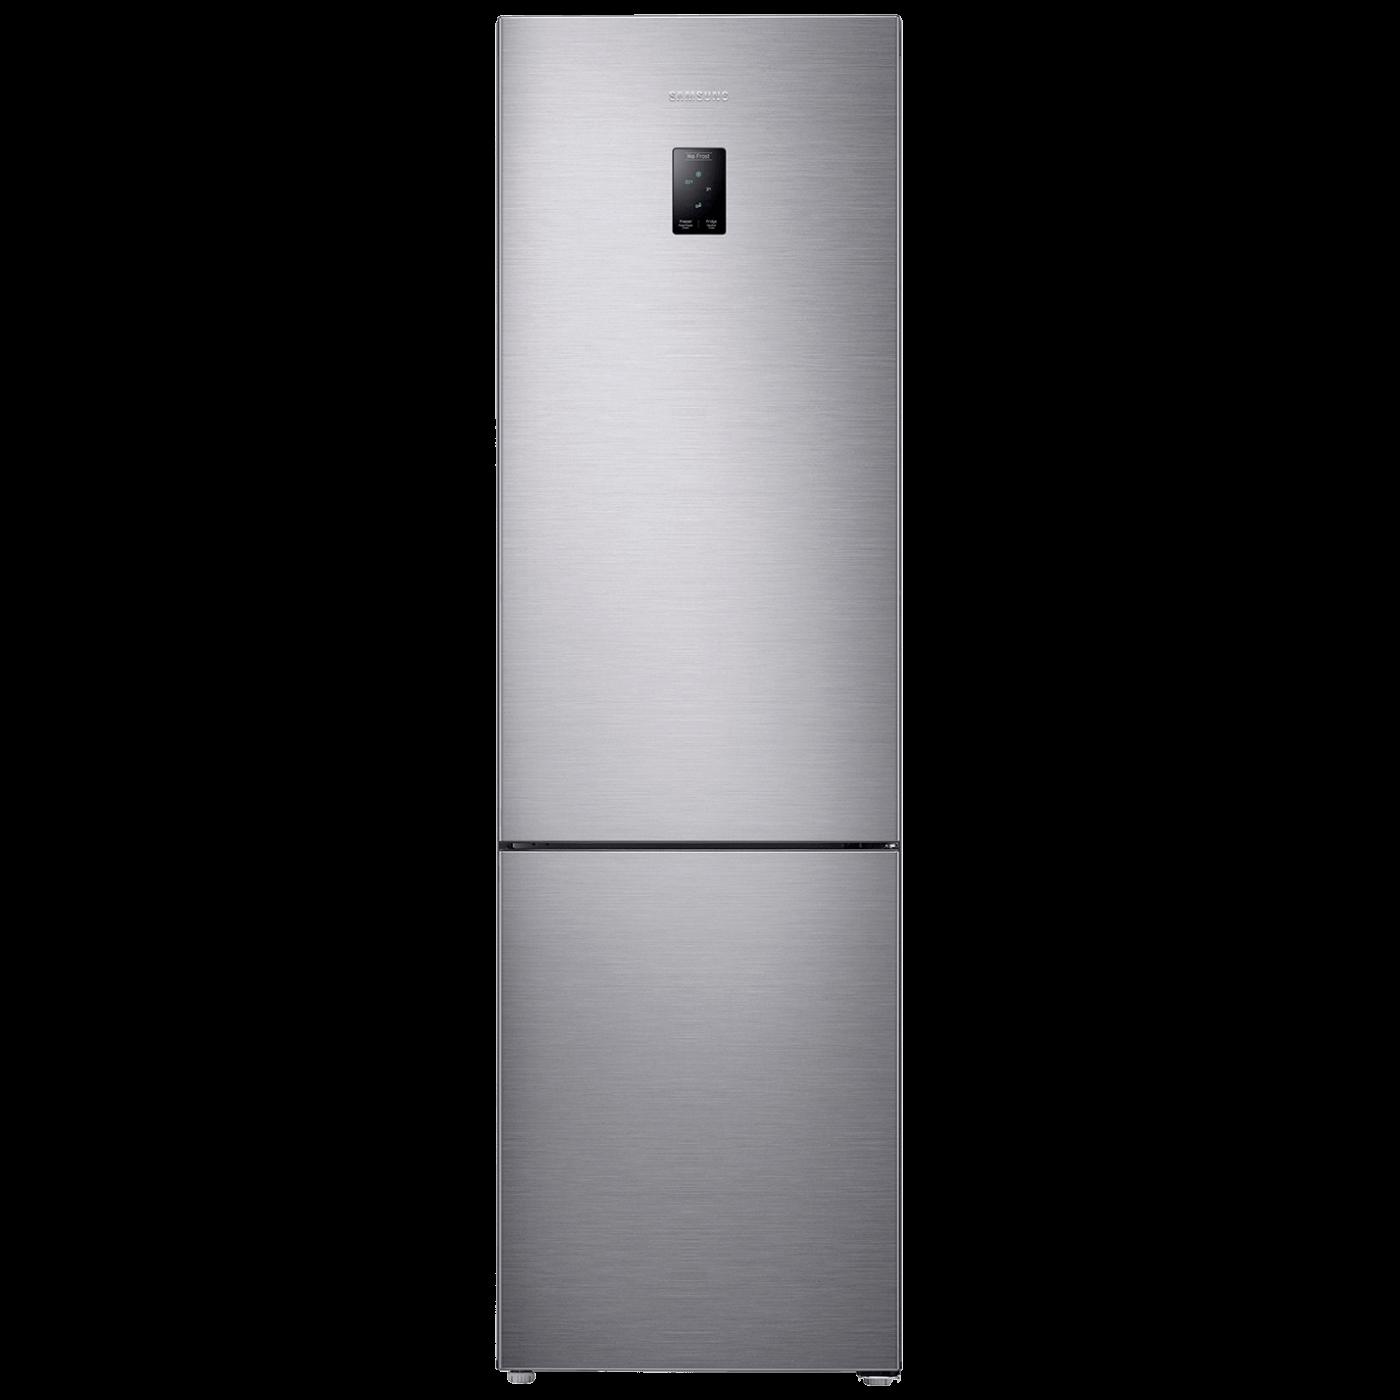 Frižider/zamrzivač, zapremina 387 l, NoFrost, Multiflow, A+